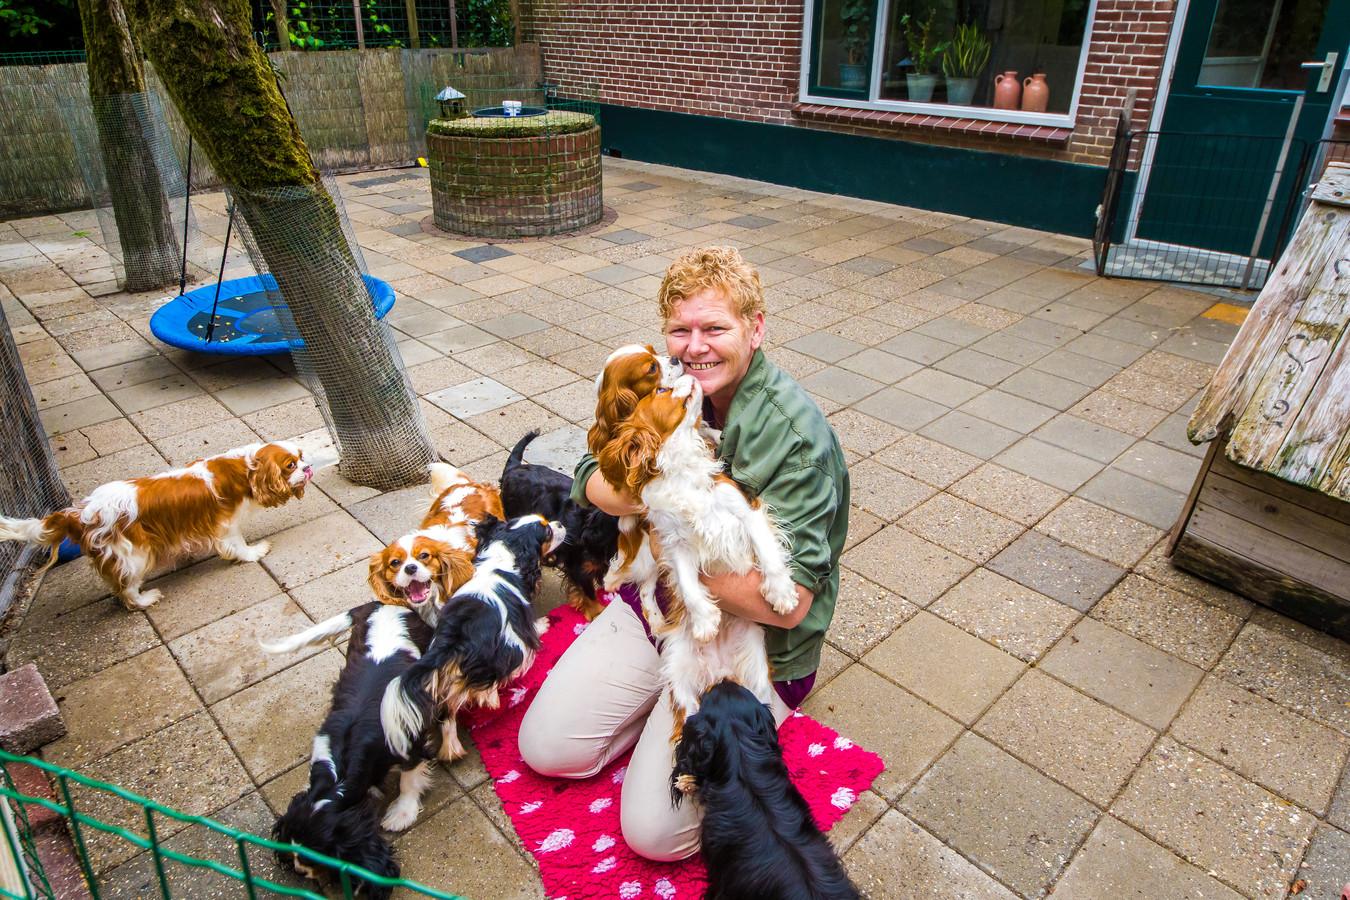 Leonie Zieverink vorig jaar met enkele van haar hondjes op het erf van haar gehuurde woonboerderij.